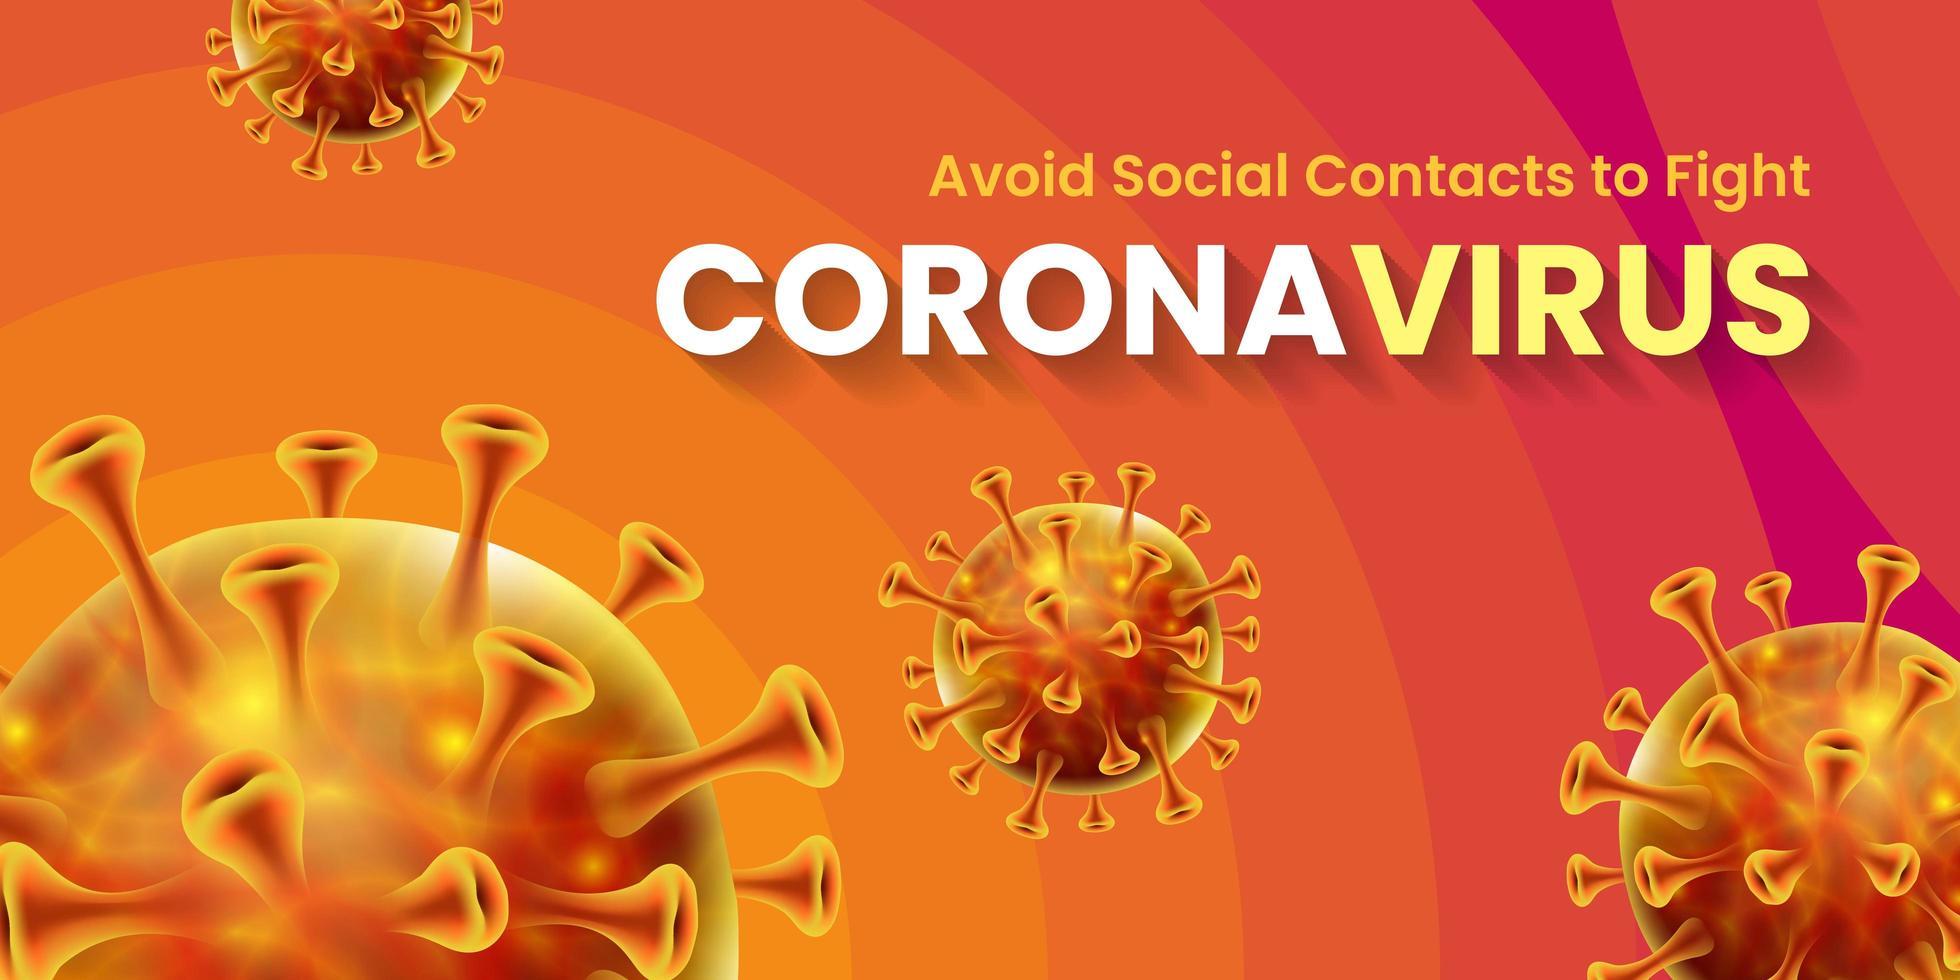 Covid-19 Corona Virus globales Pandemie-Banner-Design vektor